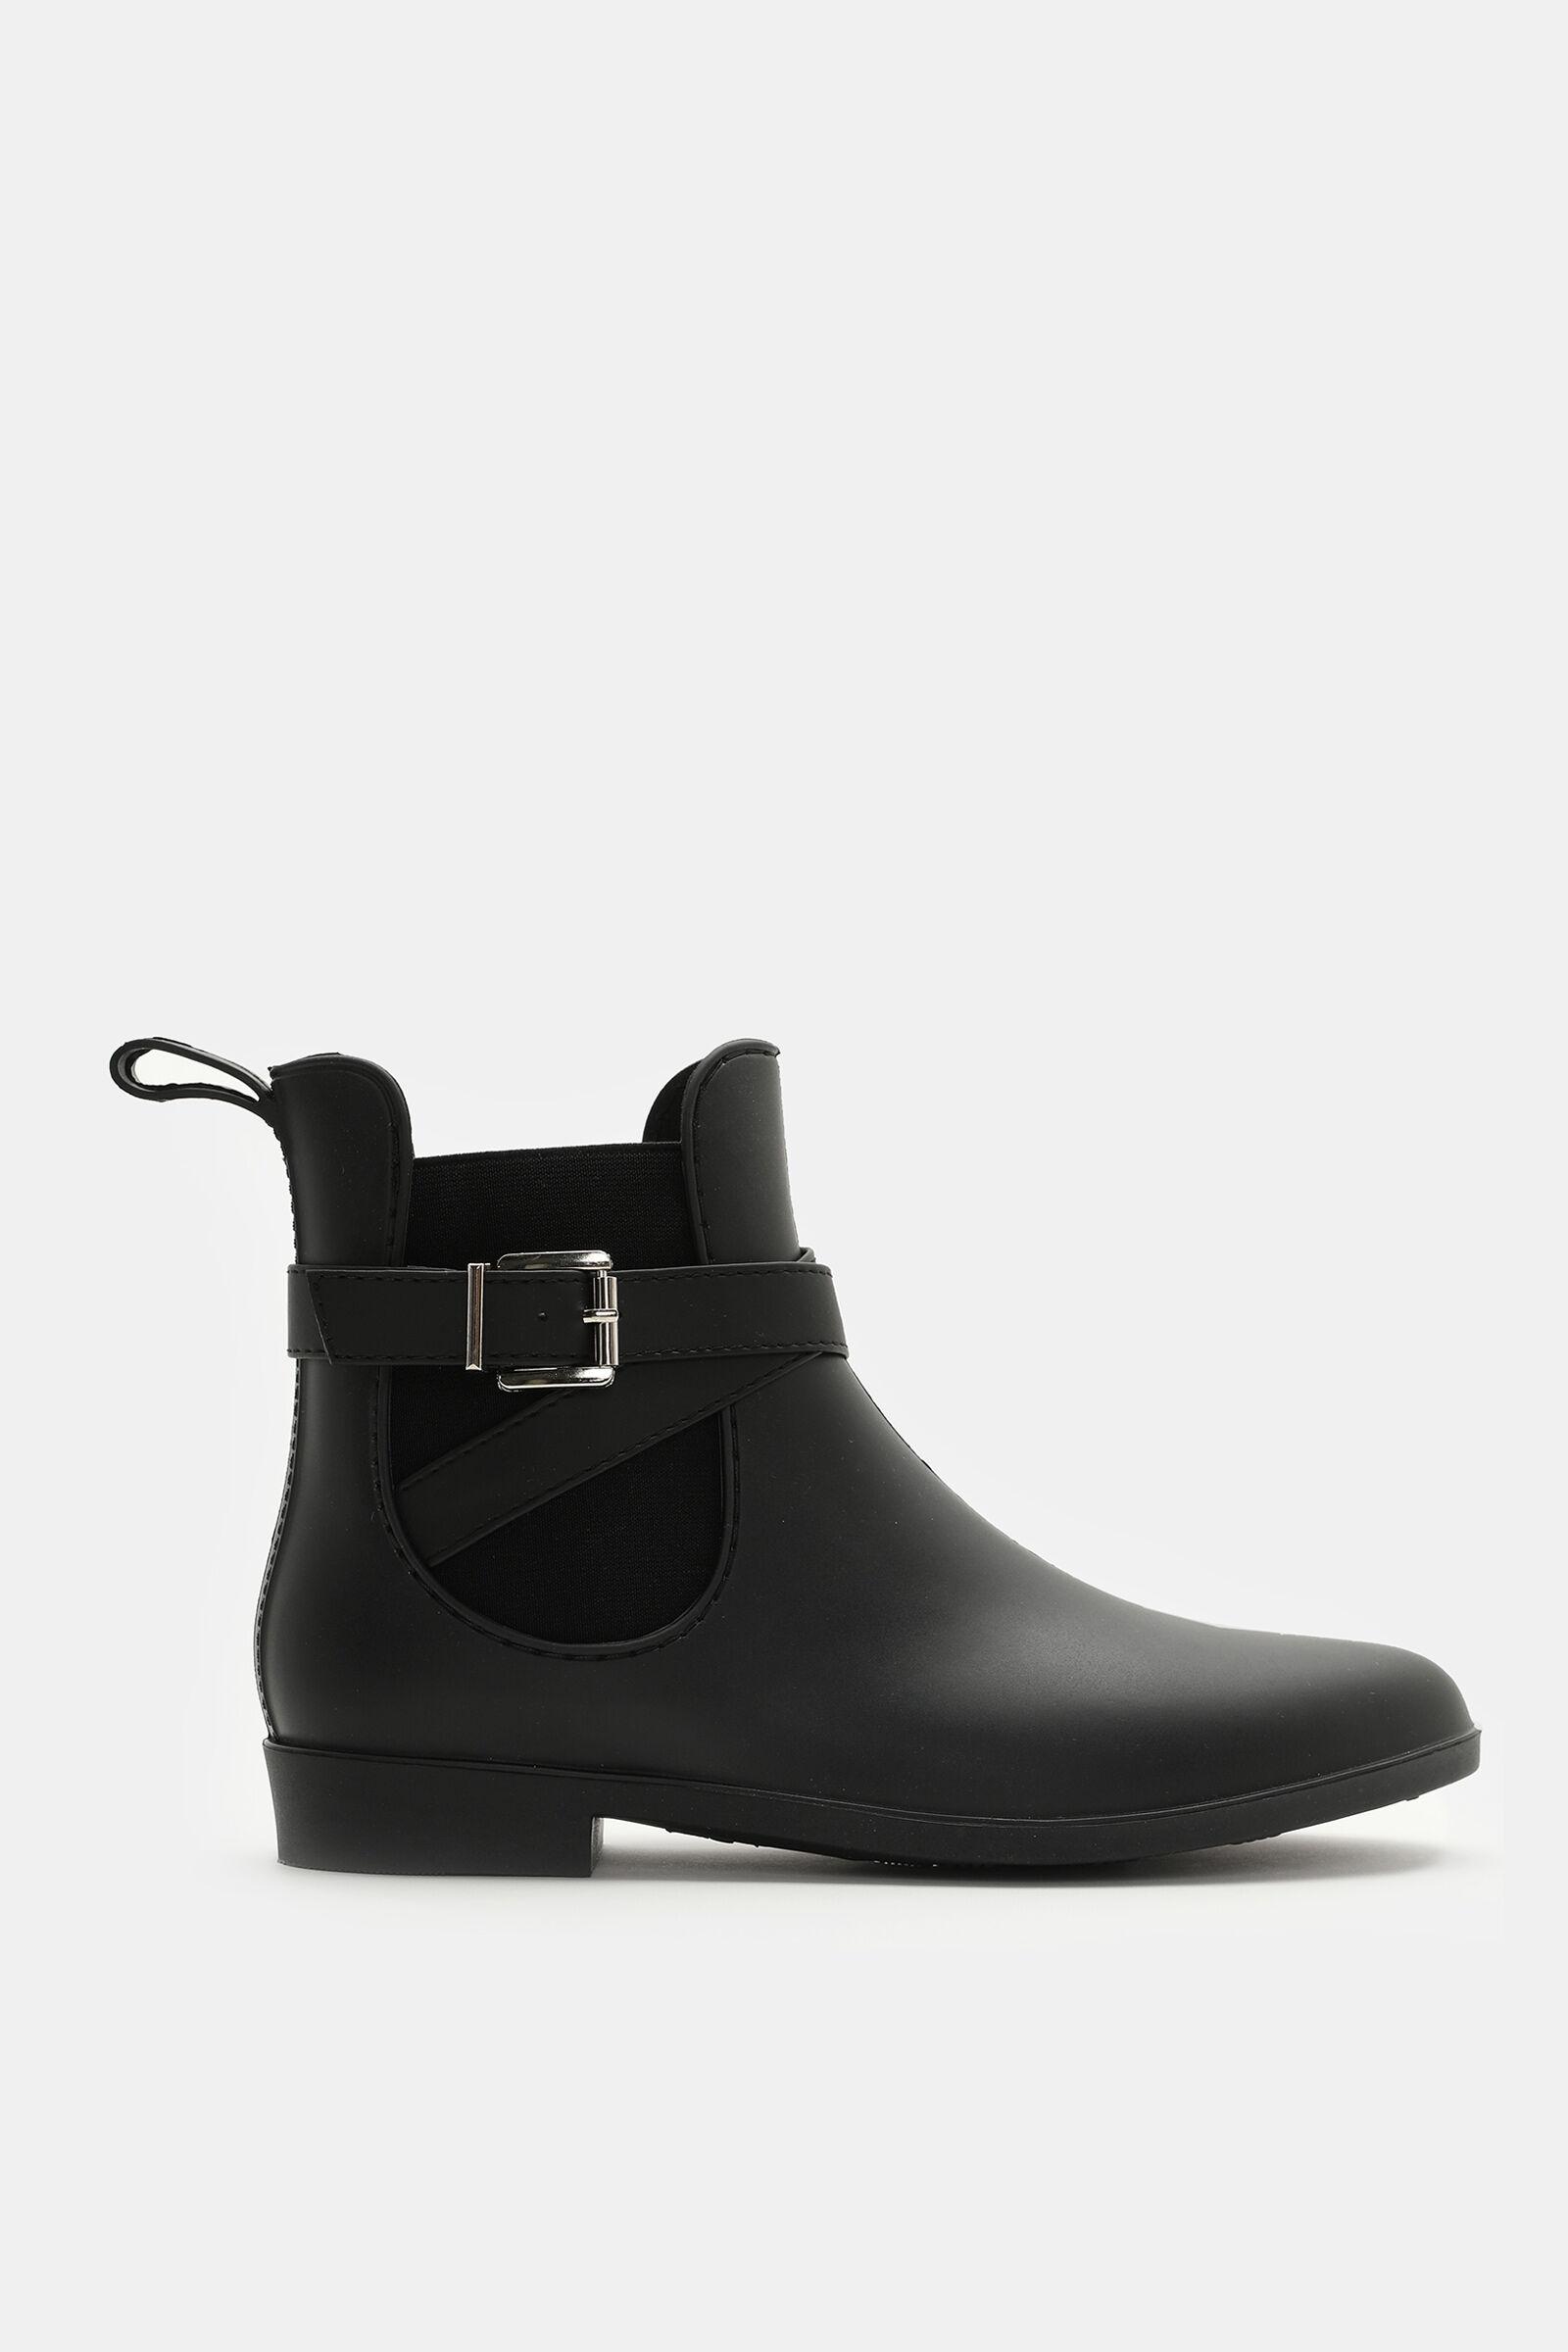 Buckled Ankle Rain Boots - Shoes | Ardene